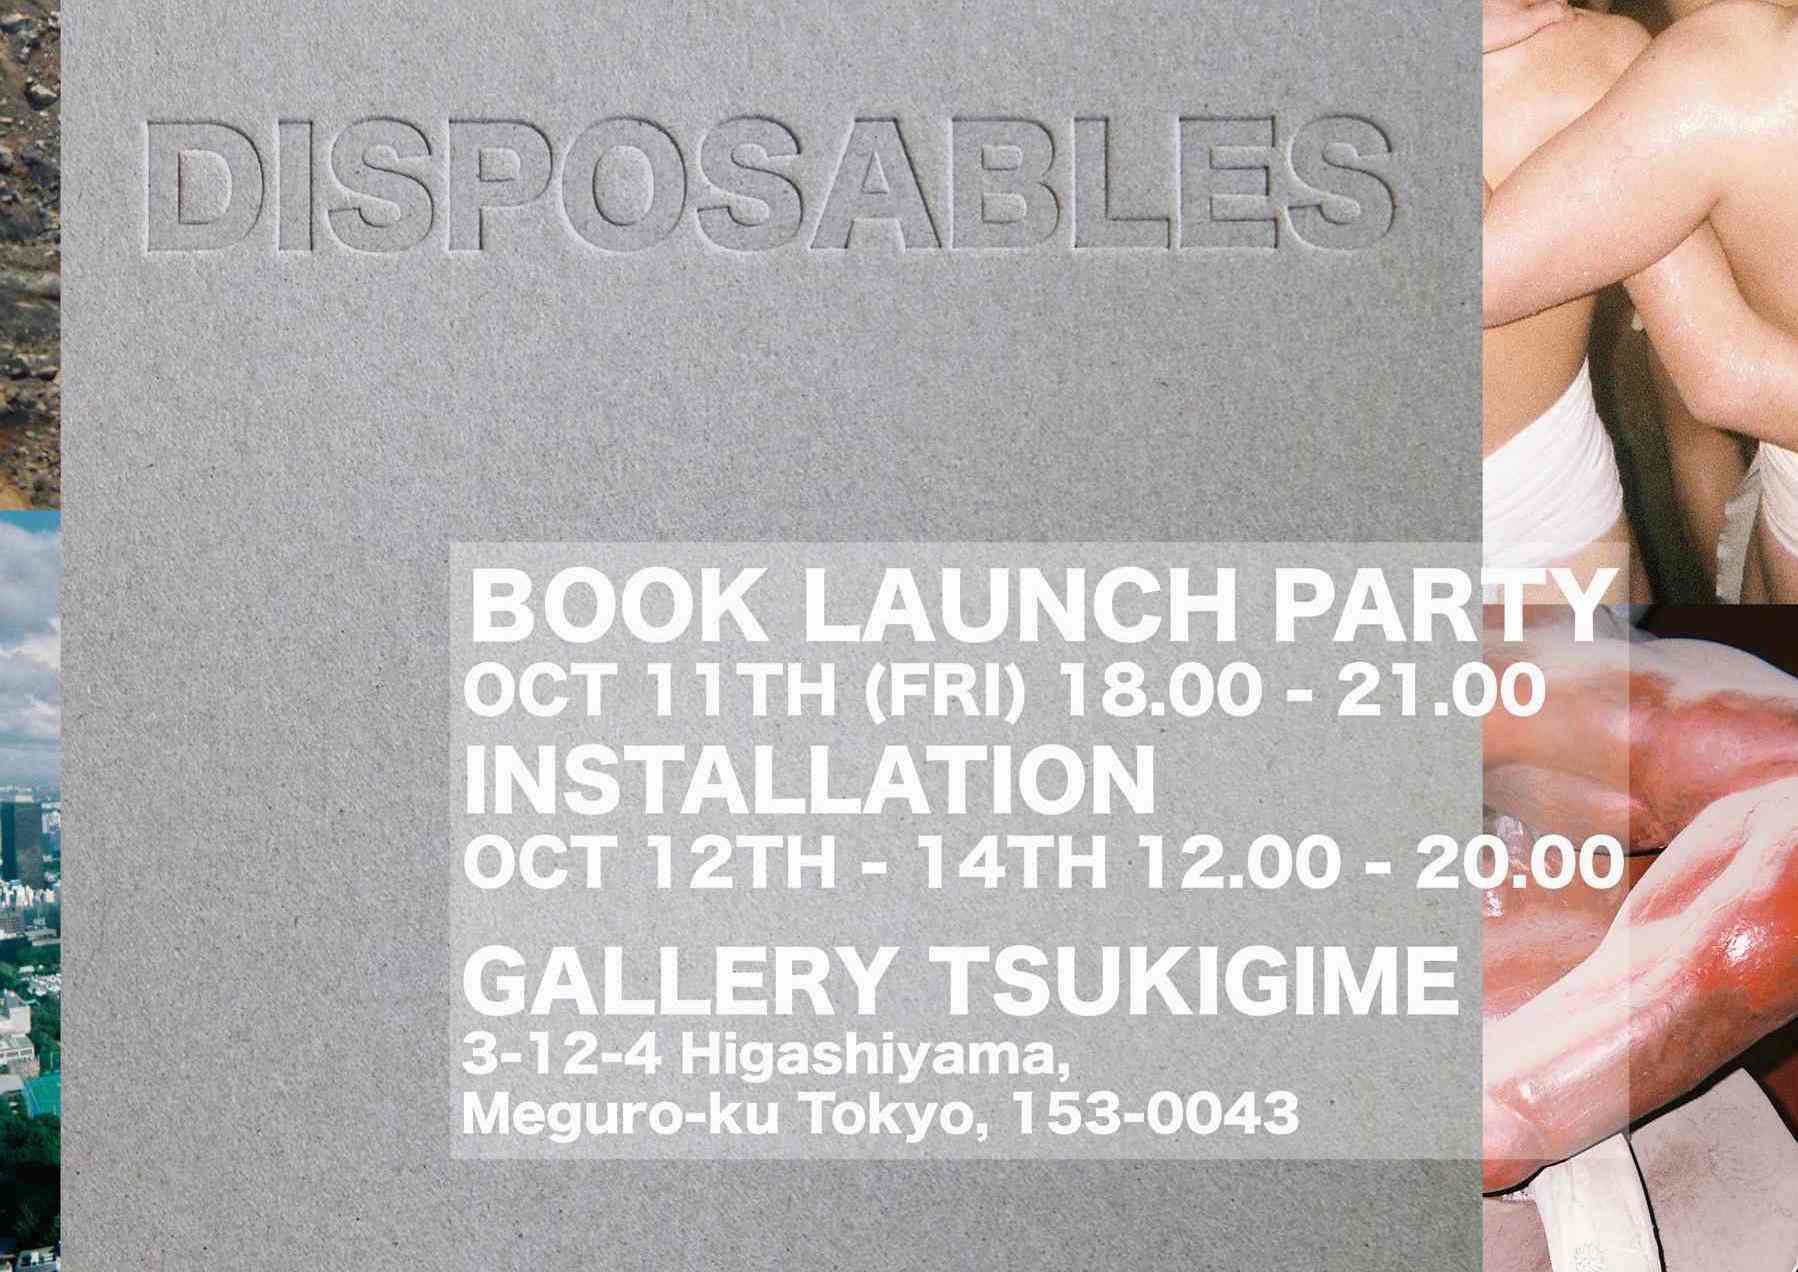 「TOKYO DANDY」ダン・ベイリーが初の写真集「DISPOSABLES」